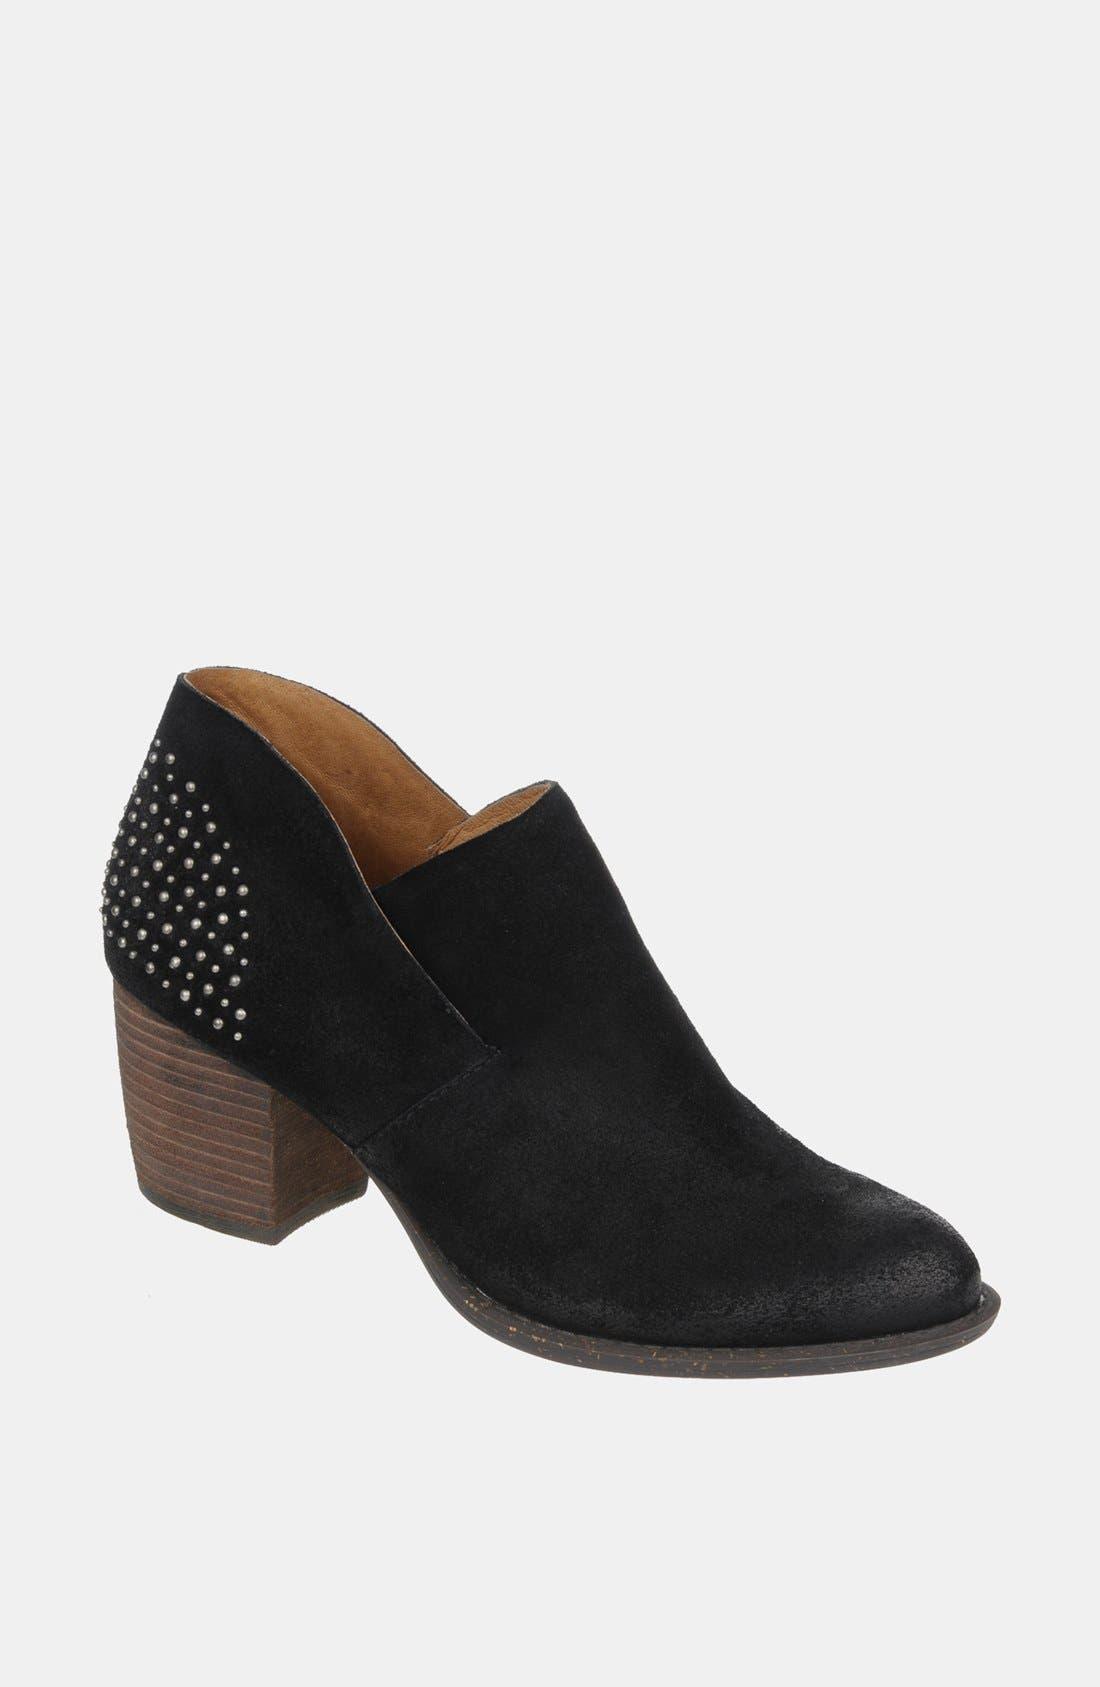 Alternate Image 1 Selected - Naya 'Valerie' Boot